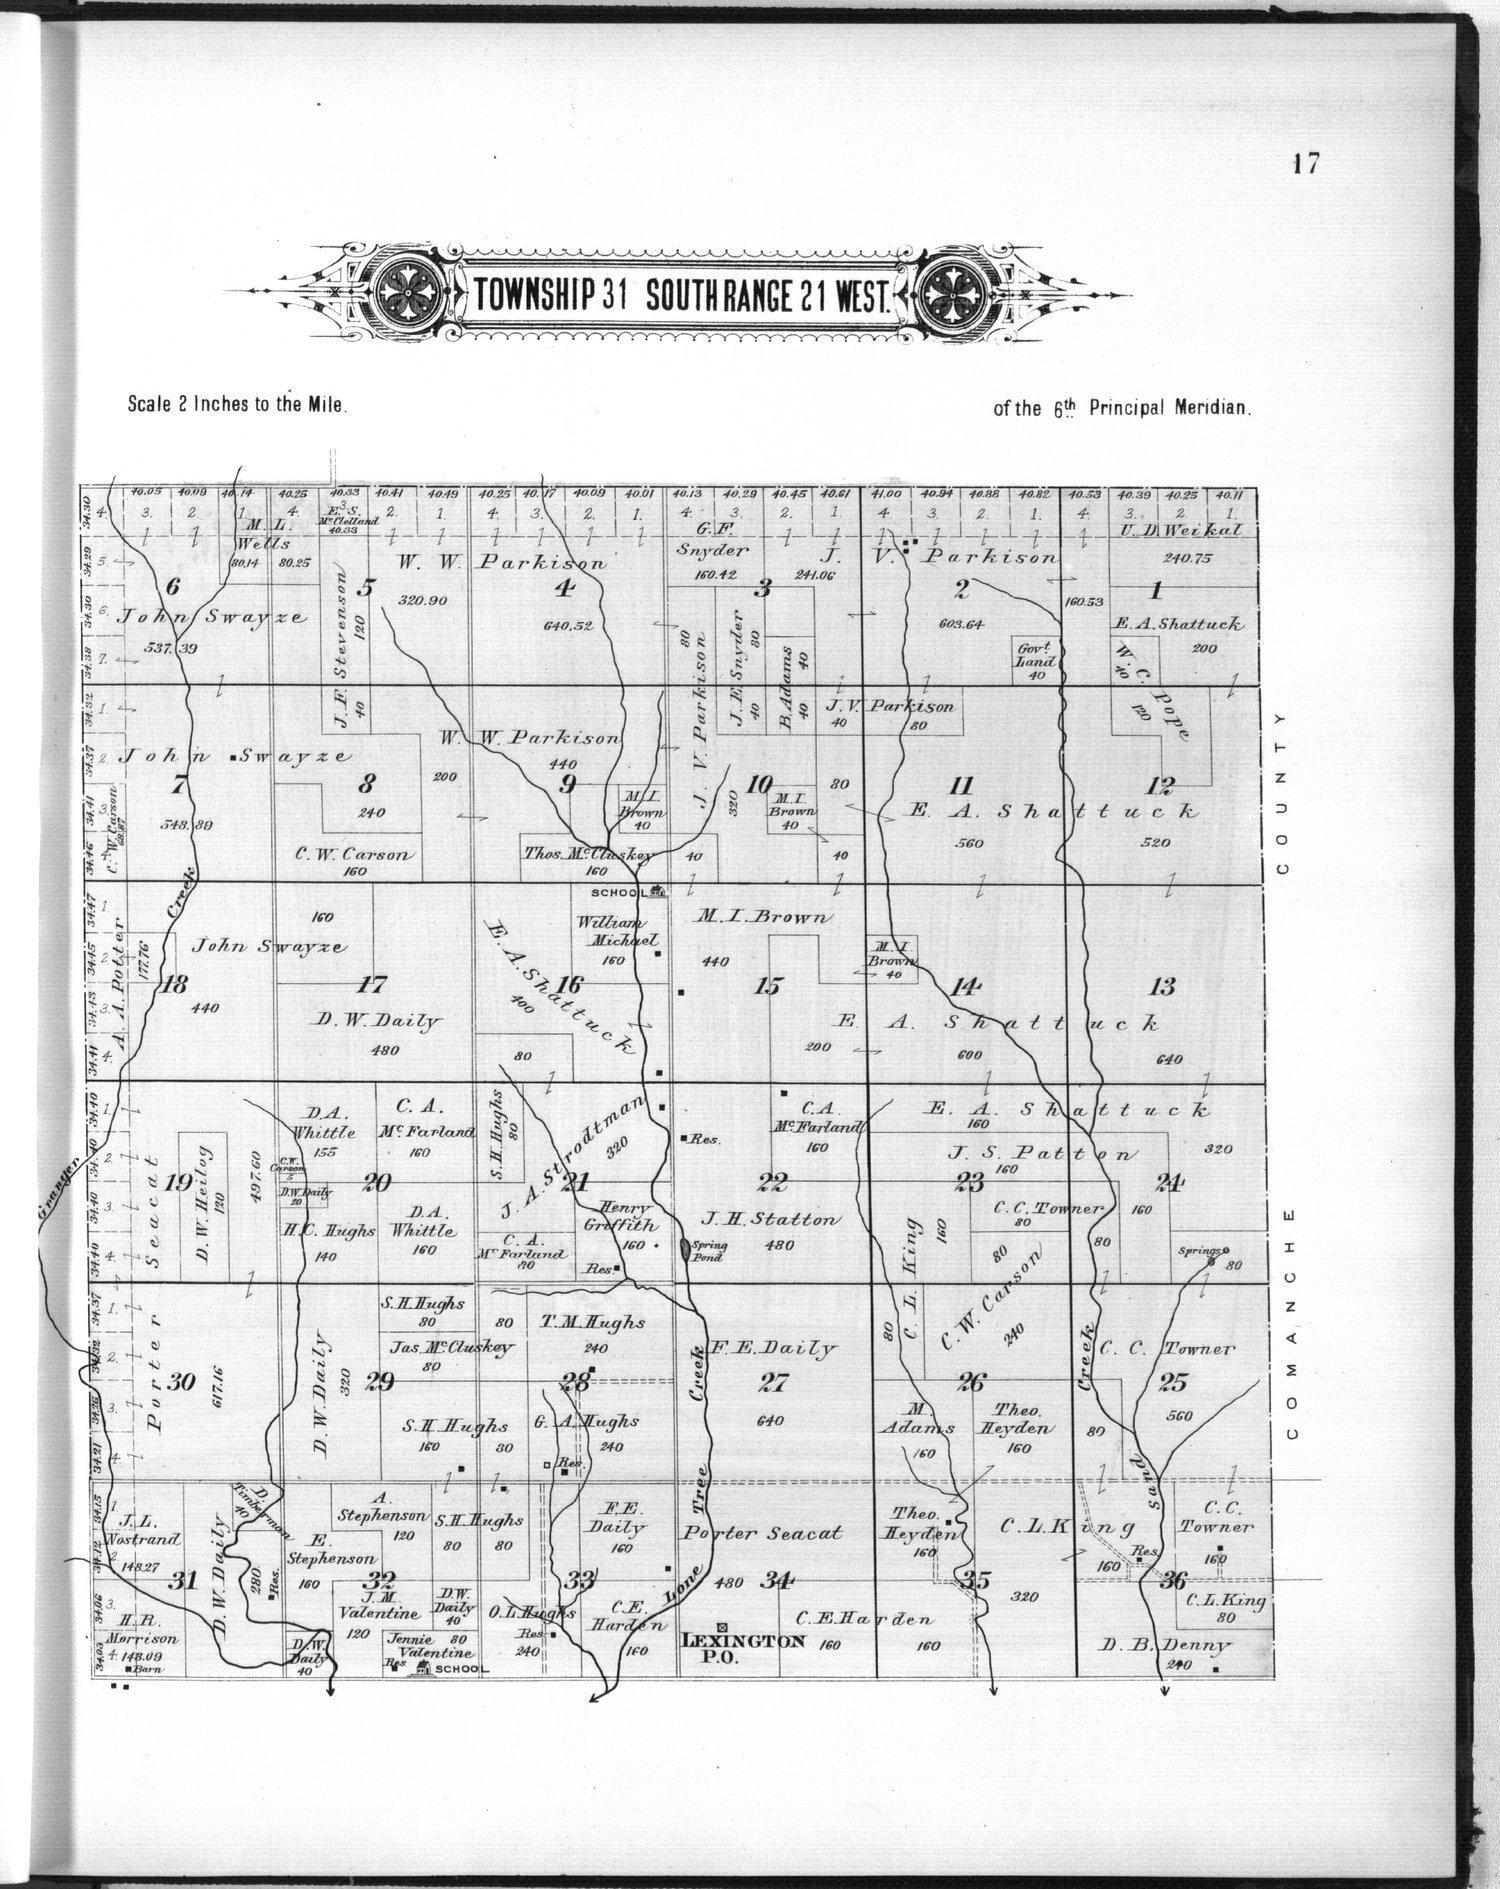 Plat book of Clark County, Kansas - 17